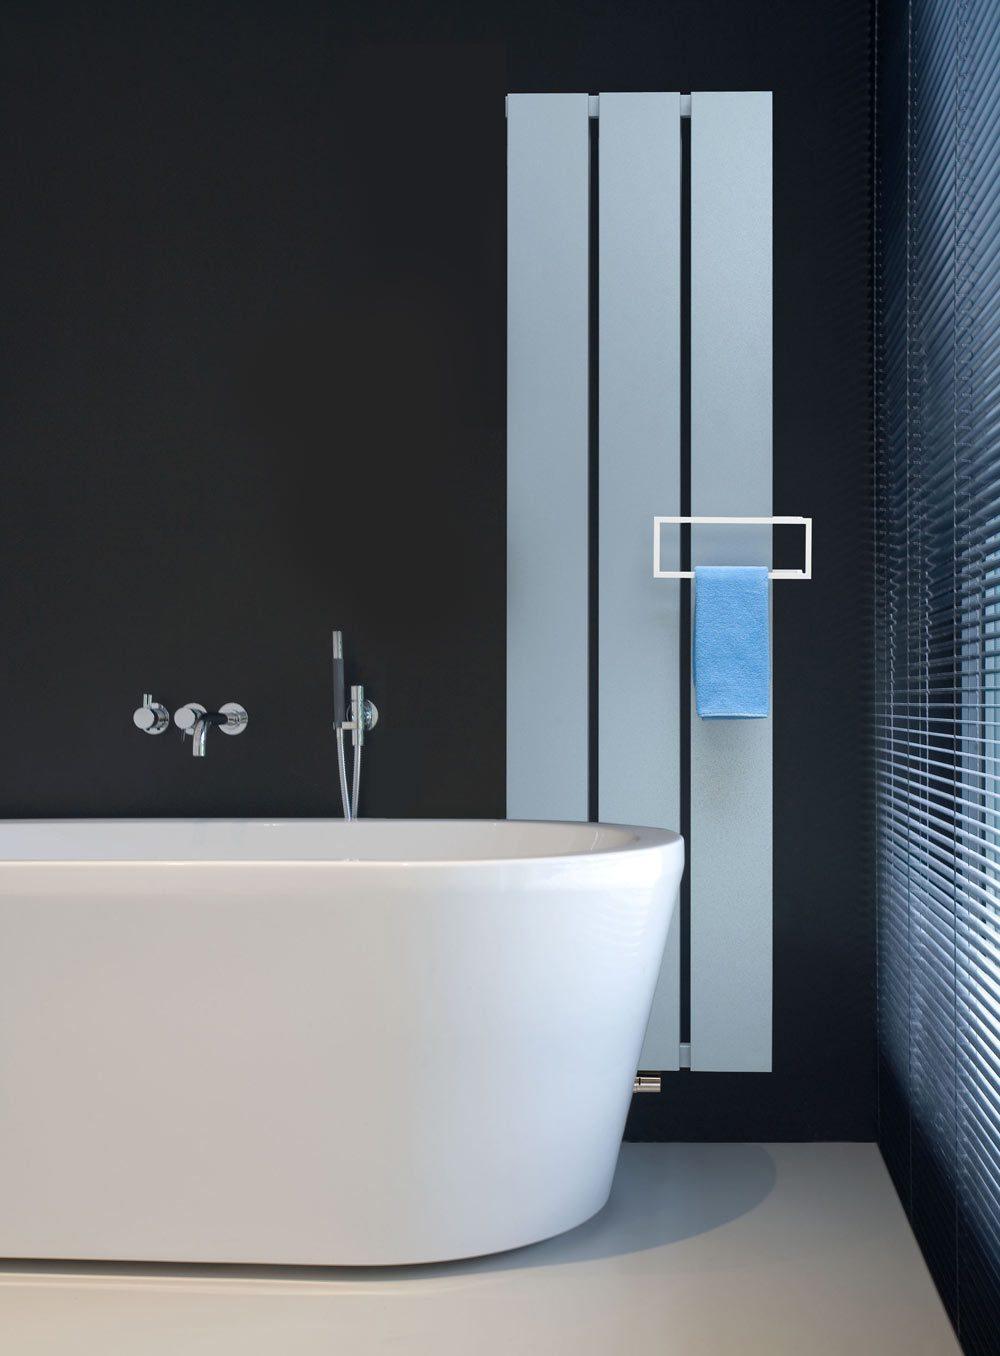 Beams Radiators | btw - baths tiles woodfloors